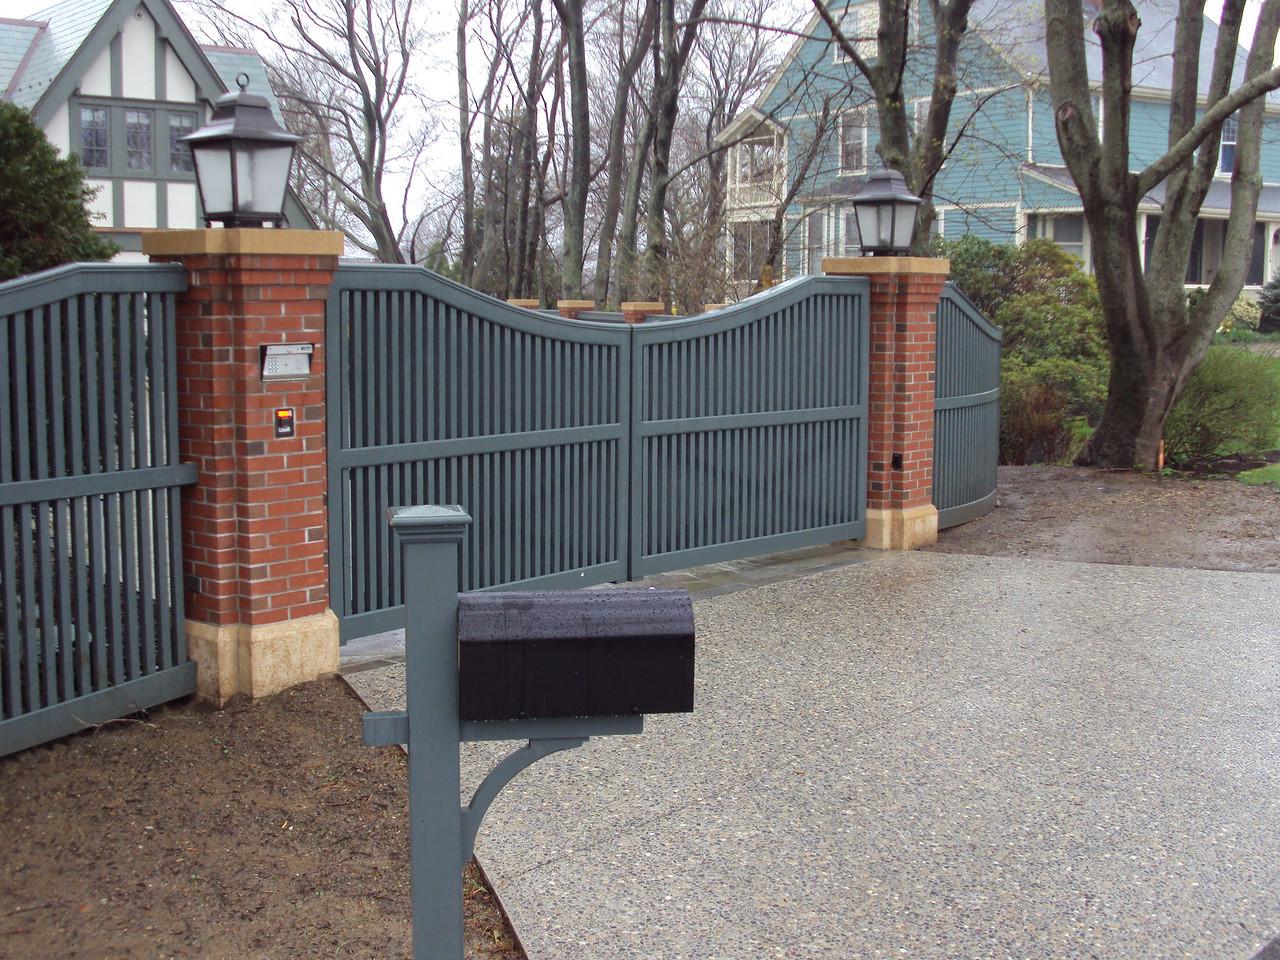 964 - 327802 - Marblehead MA - Yorktown Driveway Gate